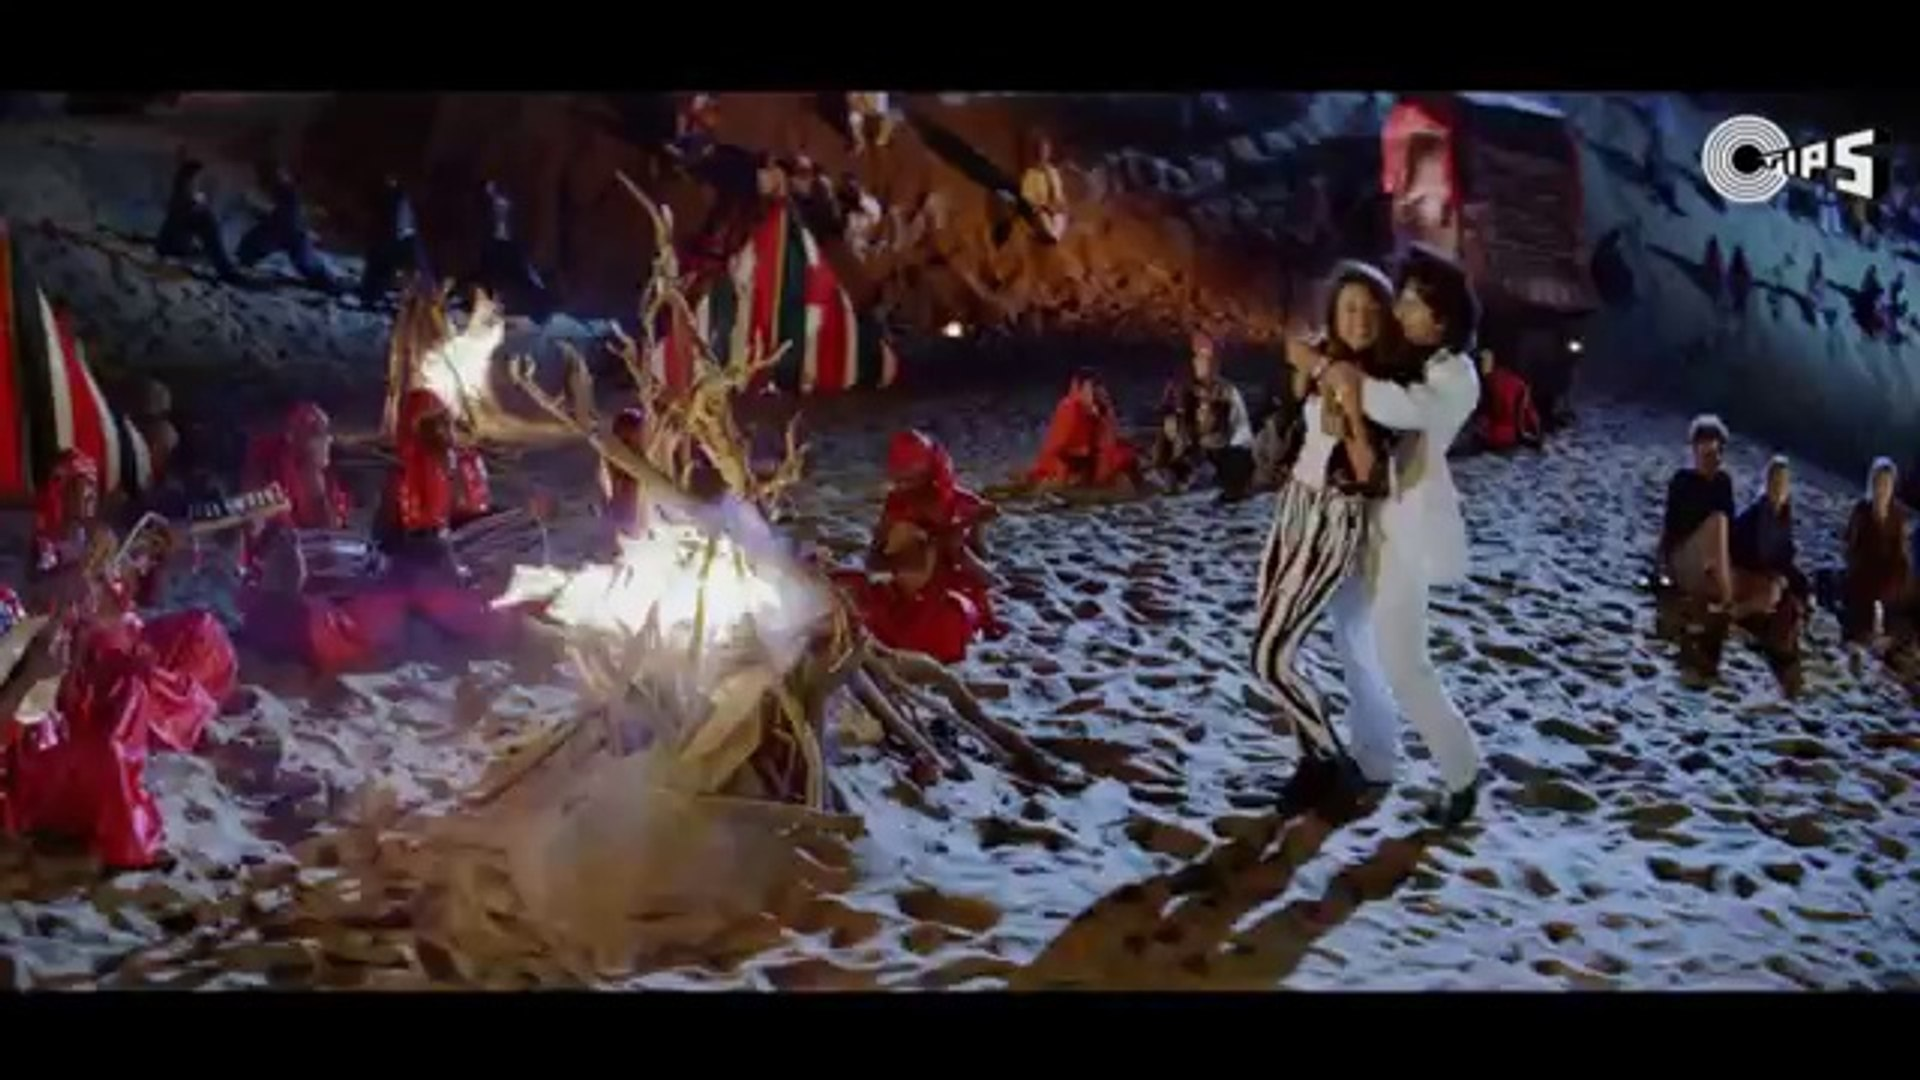 Pyar Nahin Karna Jahan - Kachche Dhaage - Ajay Devgn